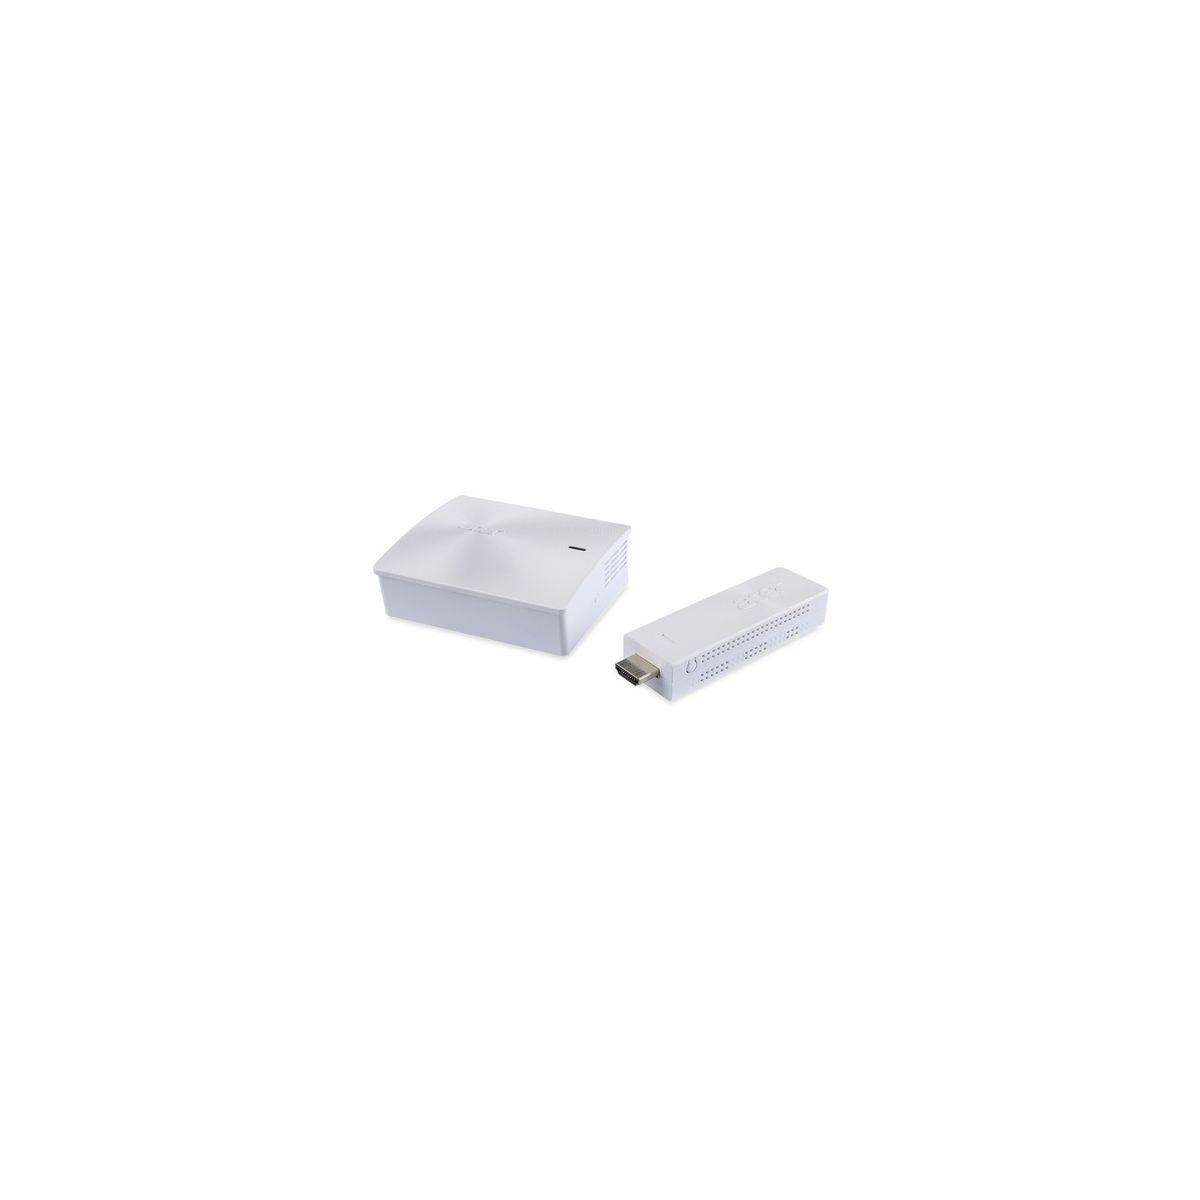 Adaptateur réseau ACER MWiHD1 Wireless HD Set